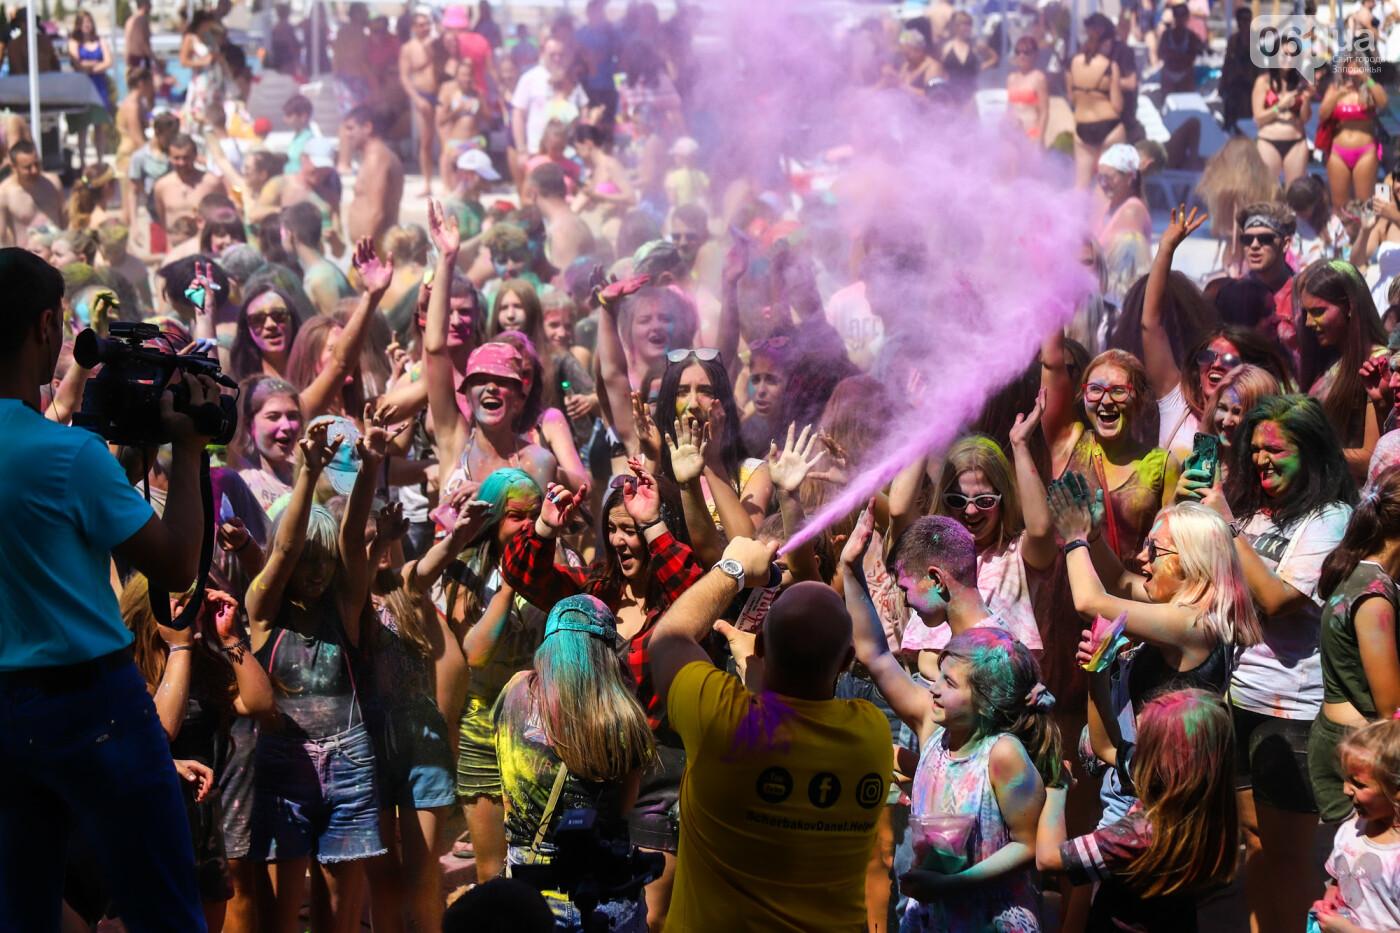 Сотни запорожцев приняли участие в фестивале красок Холи, - ФОТОРЕПОРТАЖ, фото-18